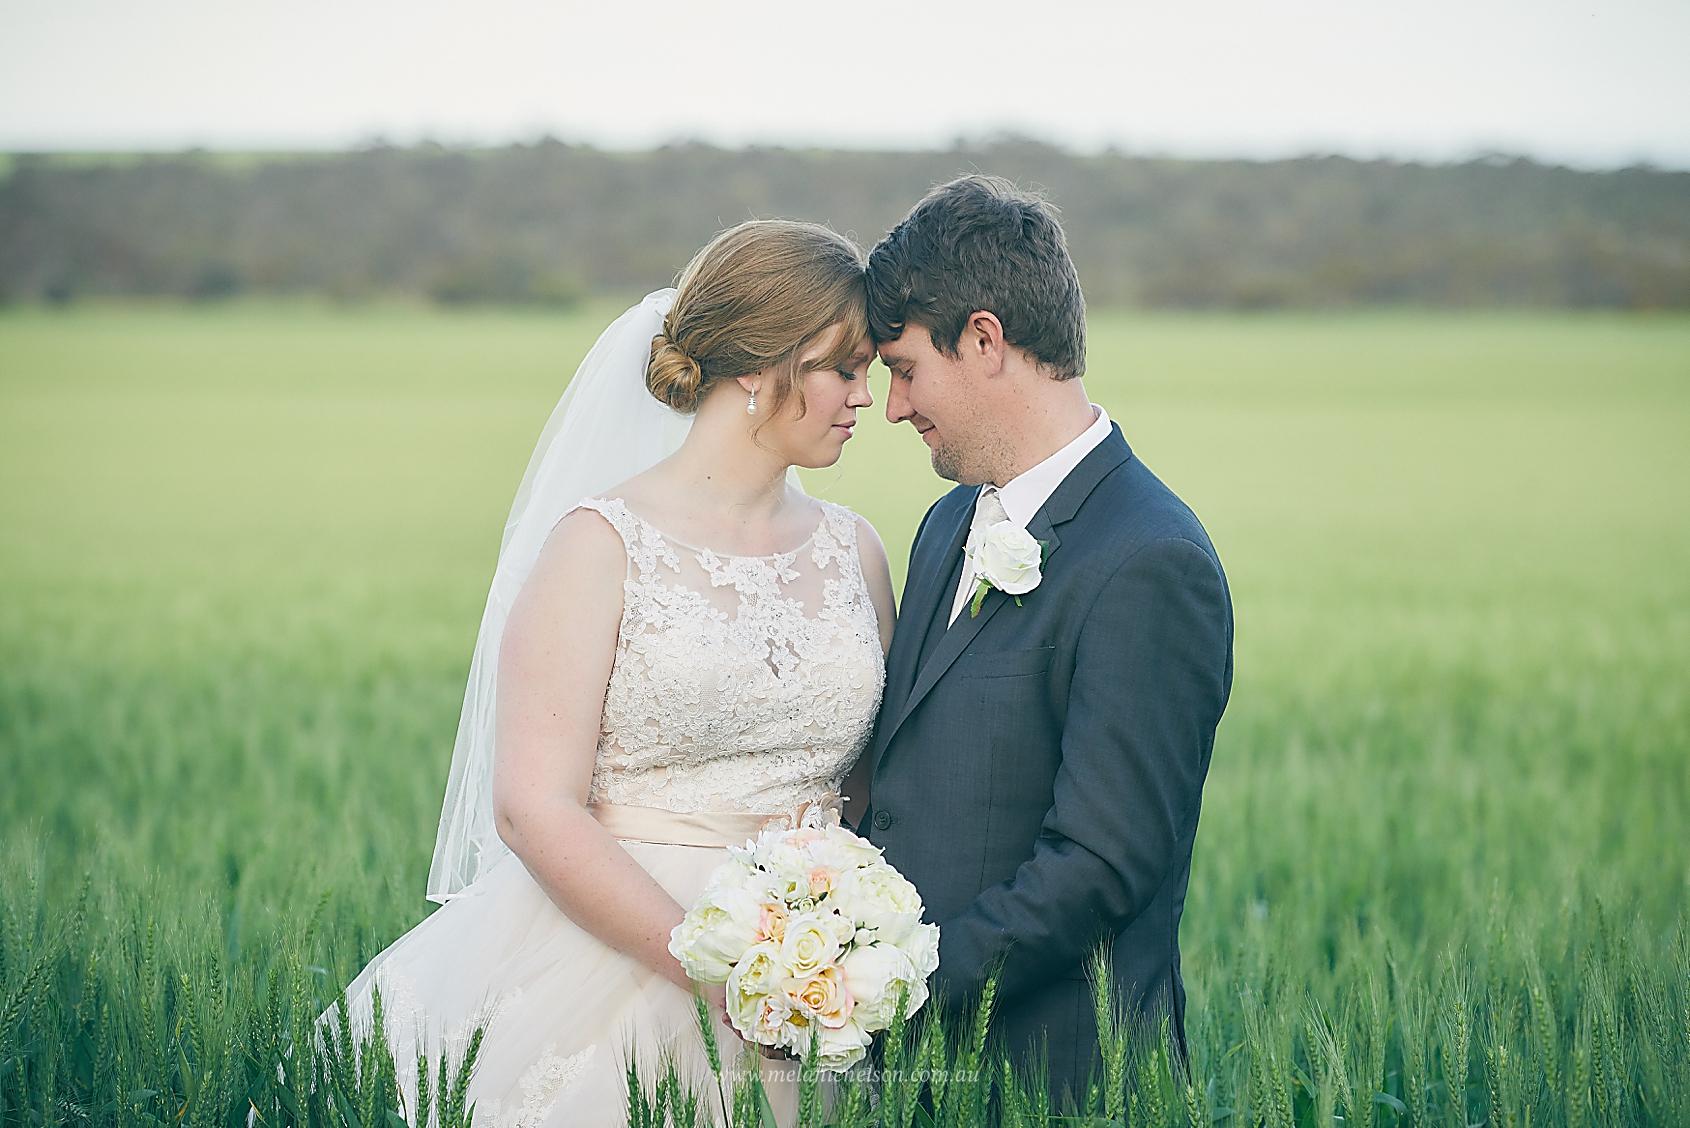 yorke_peninsula_wedding_photographer_0079.jpg